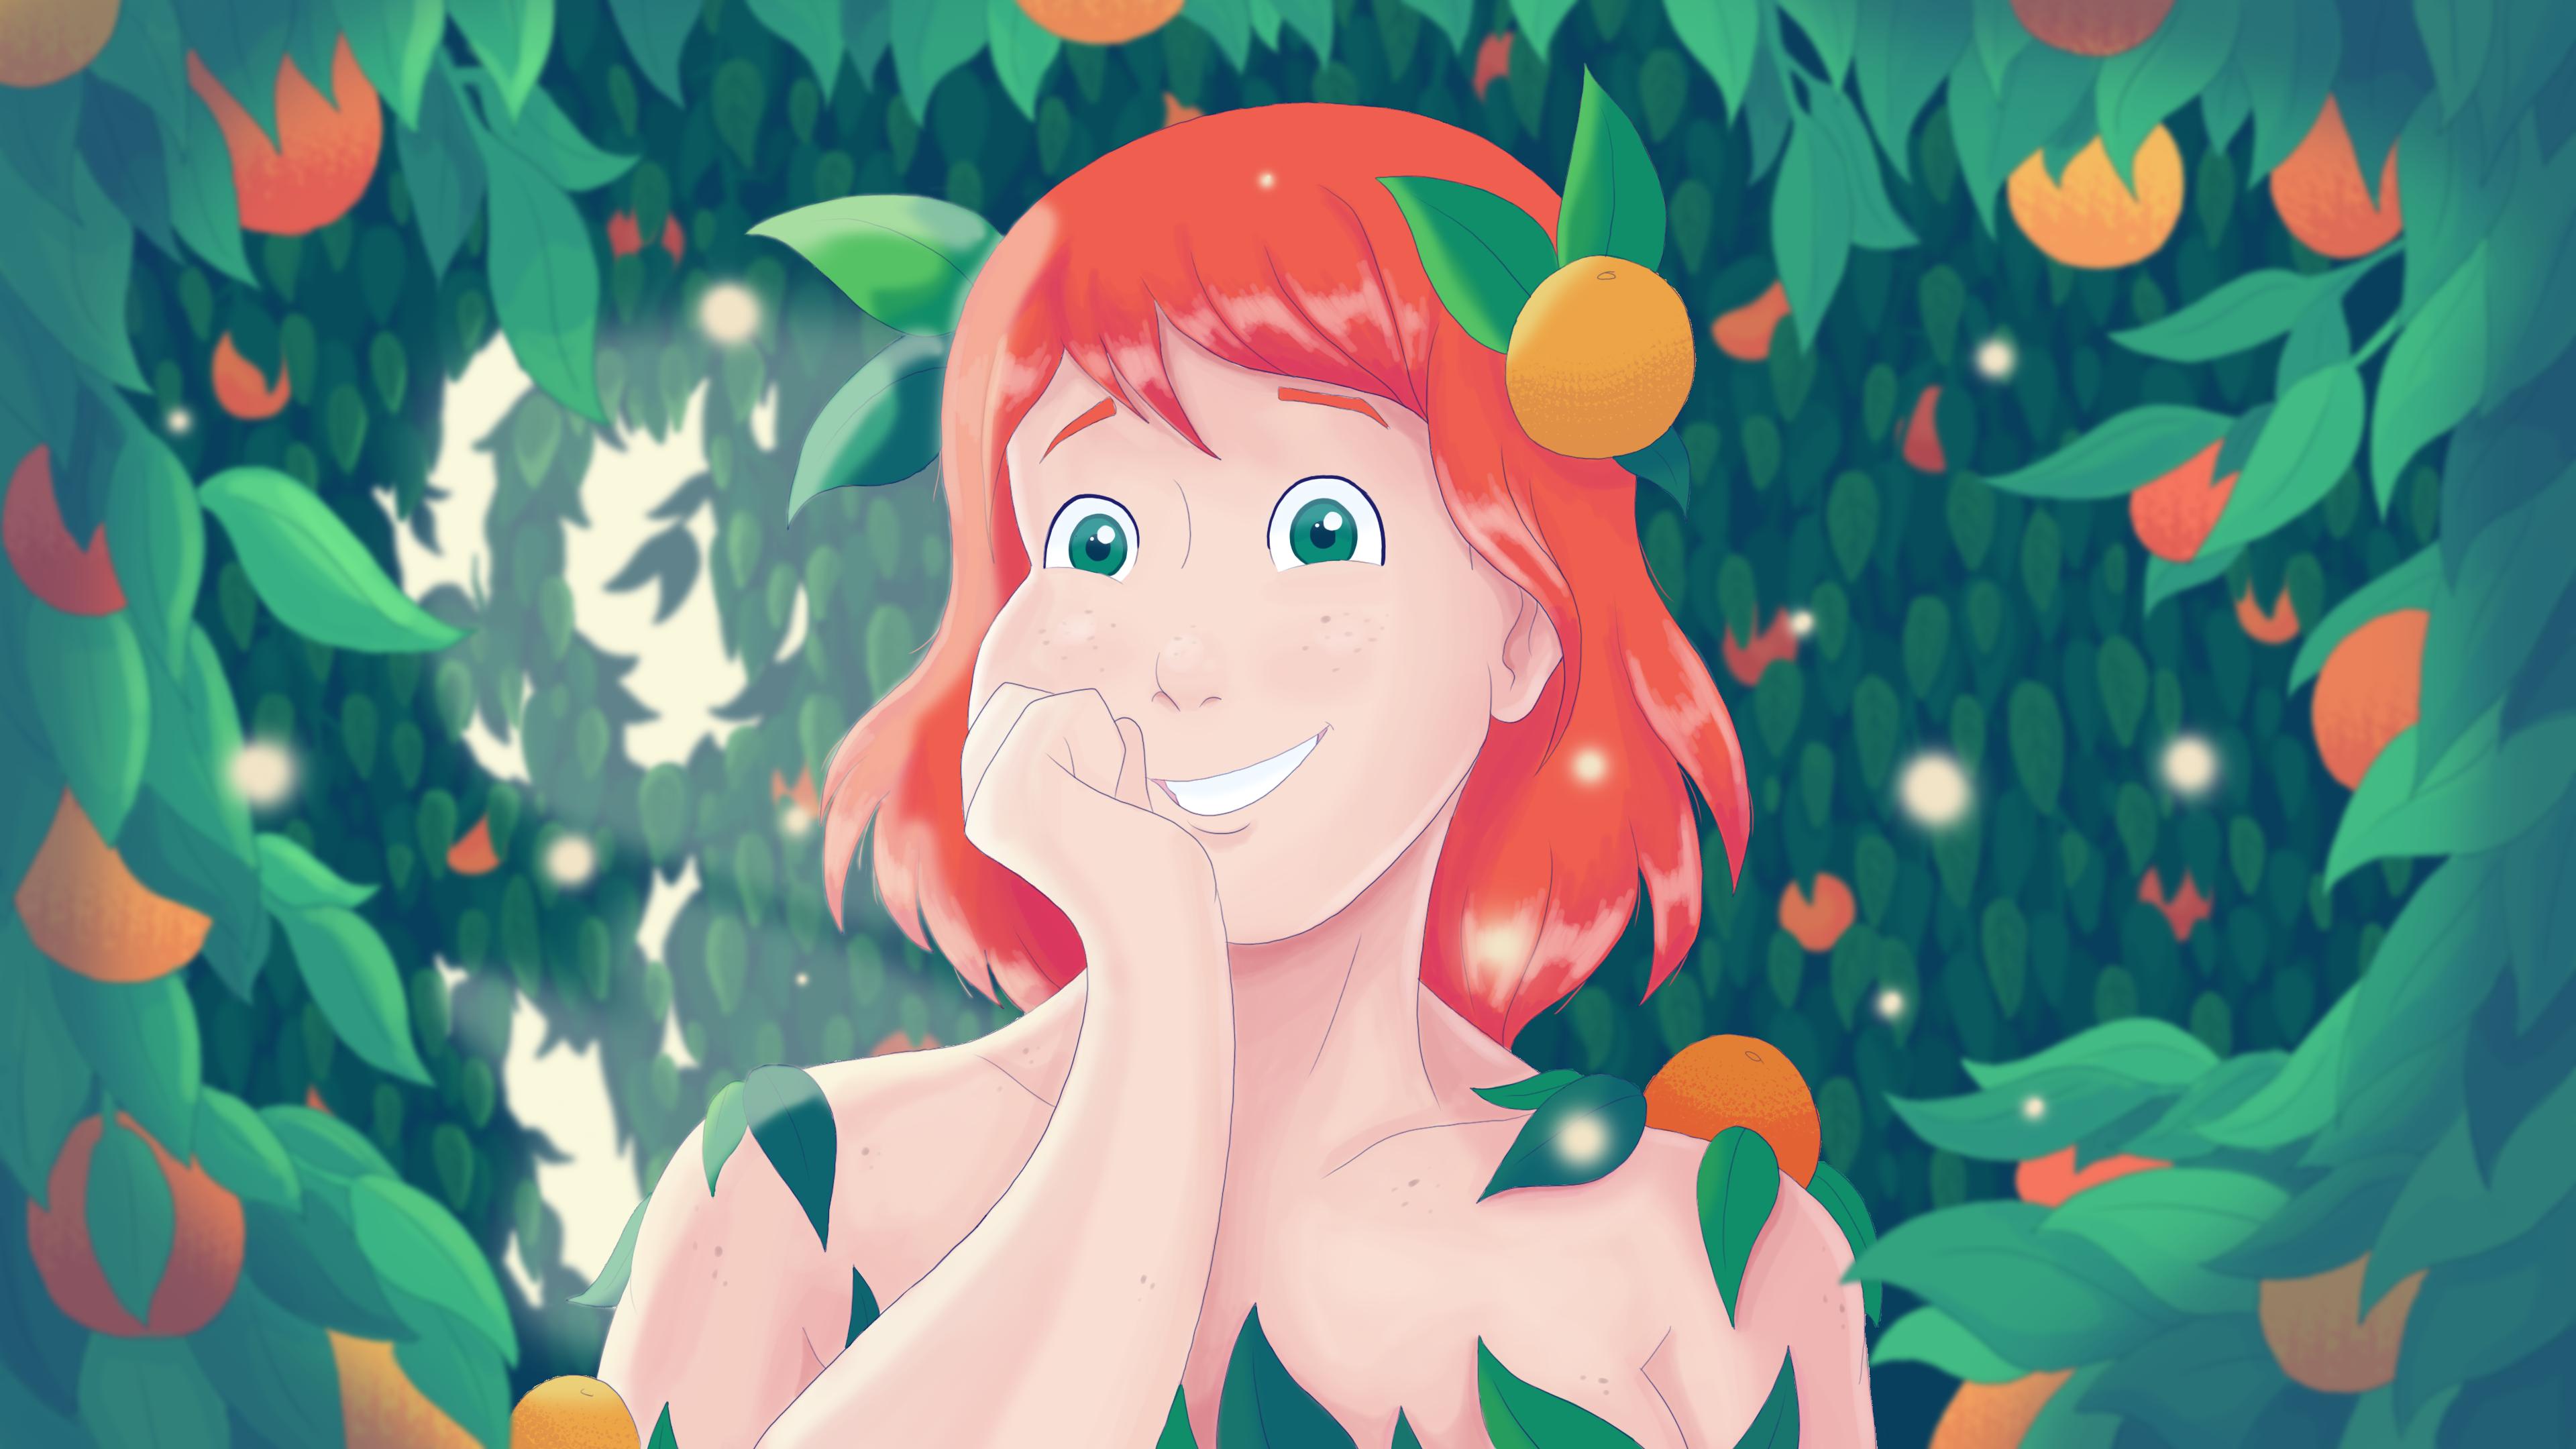 Ms. Orange